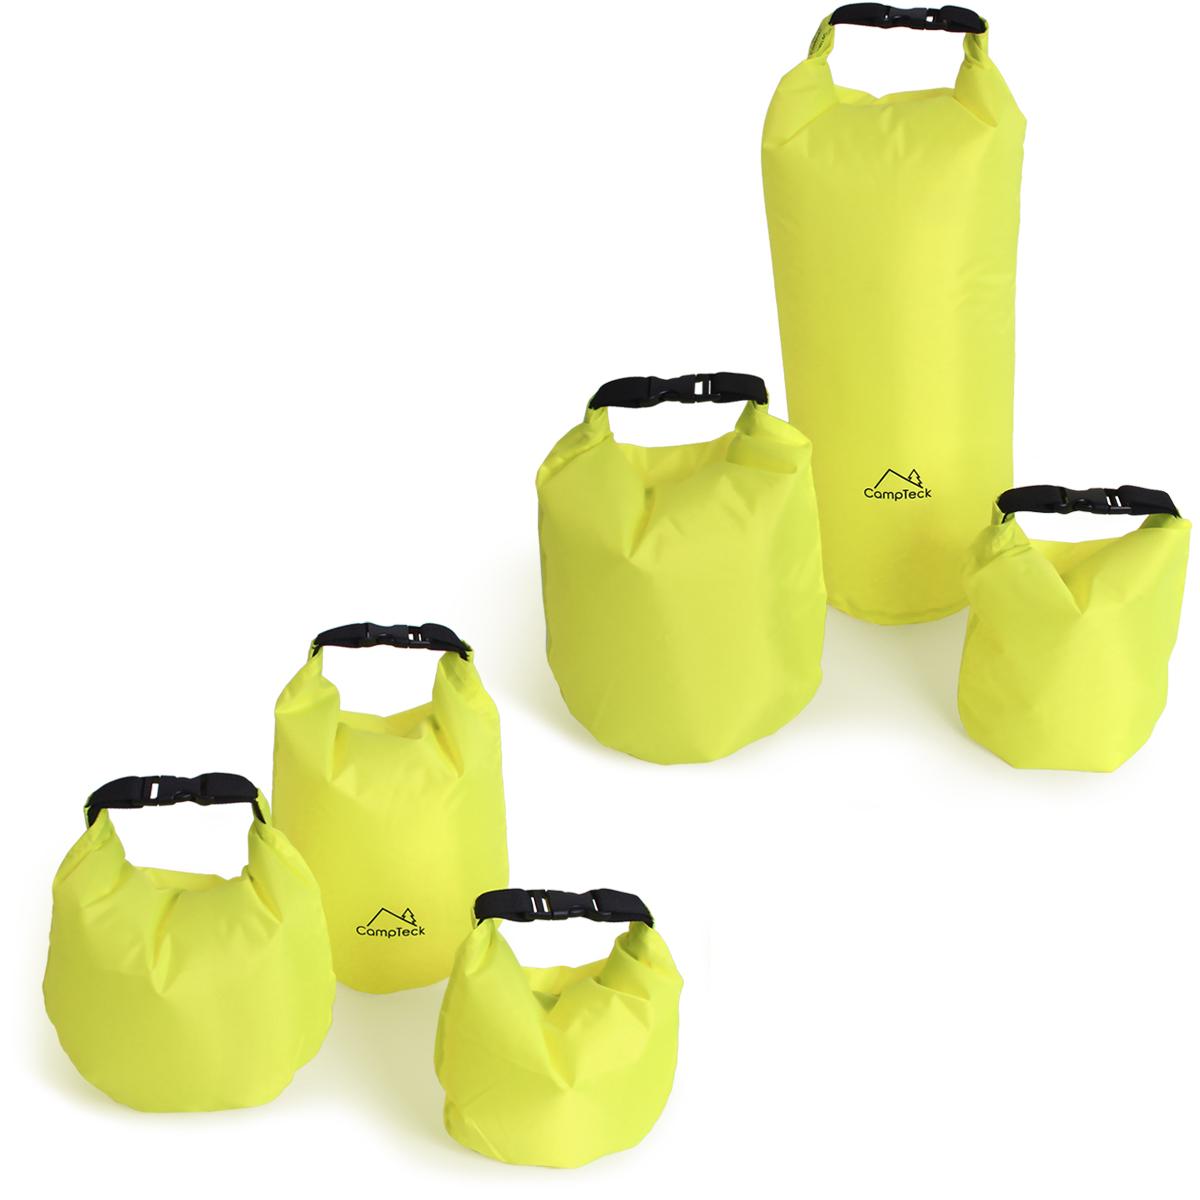 CampTeck Dry Sack Water Resistant Storage Dry Bag for Camping, Rafting, Fishing, Canoeing, Boating, Kayaking etc.